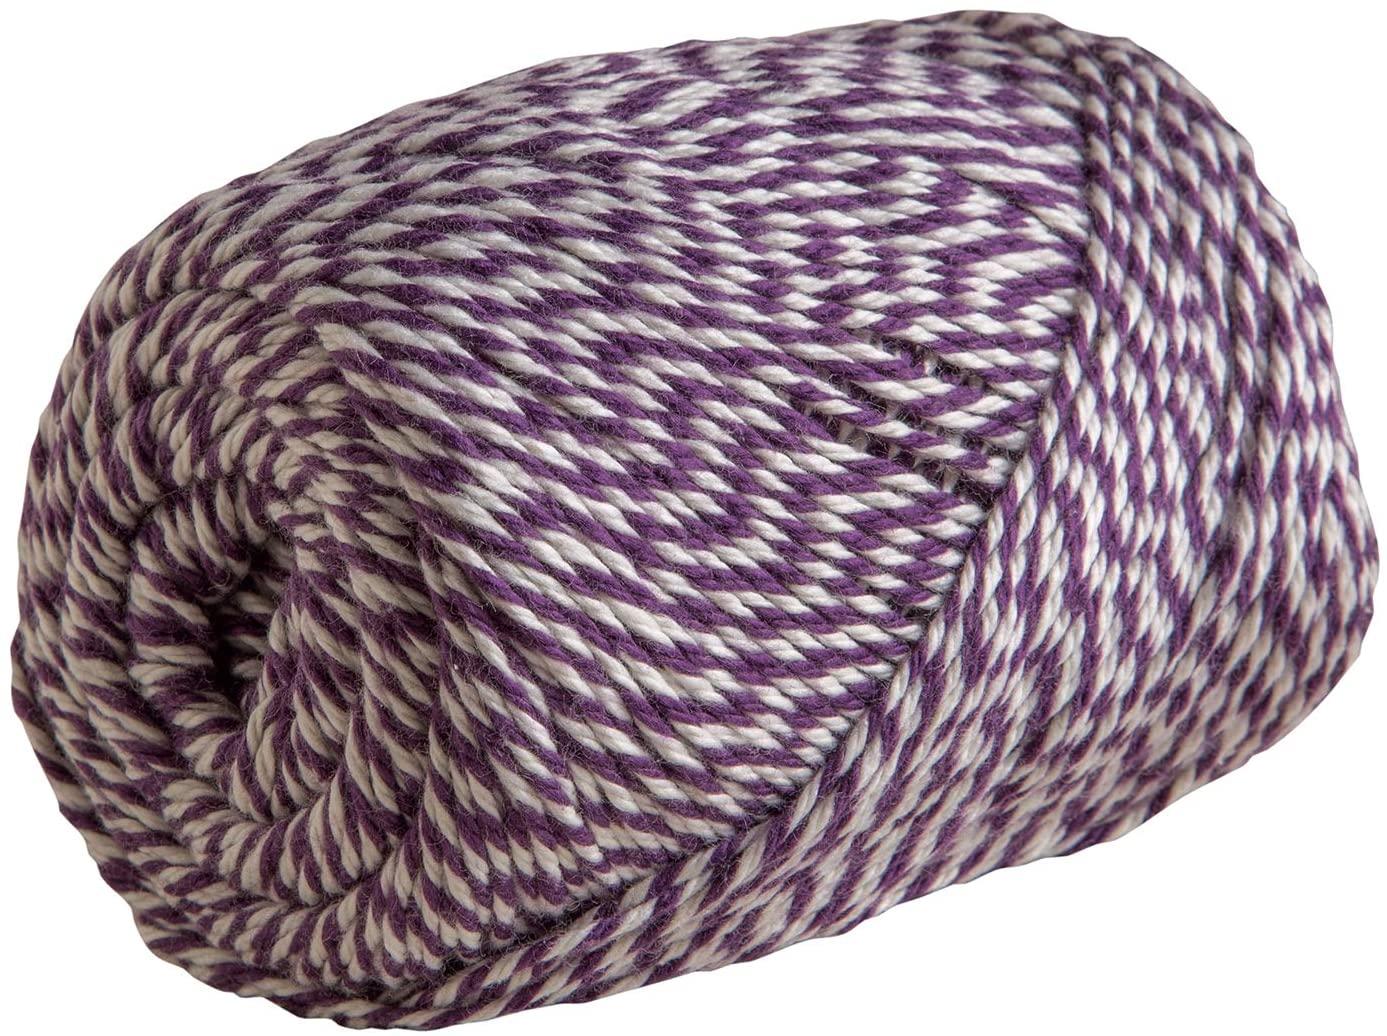 Knit Picks Dishie Twist Worsted Weight 100% Cotton Yarn - 100 g (Mulberry)